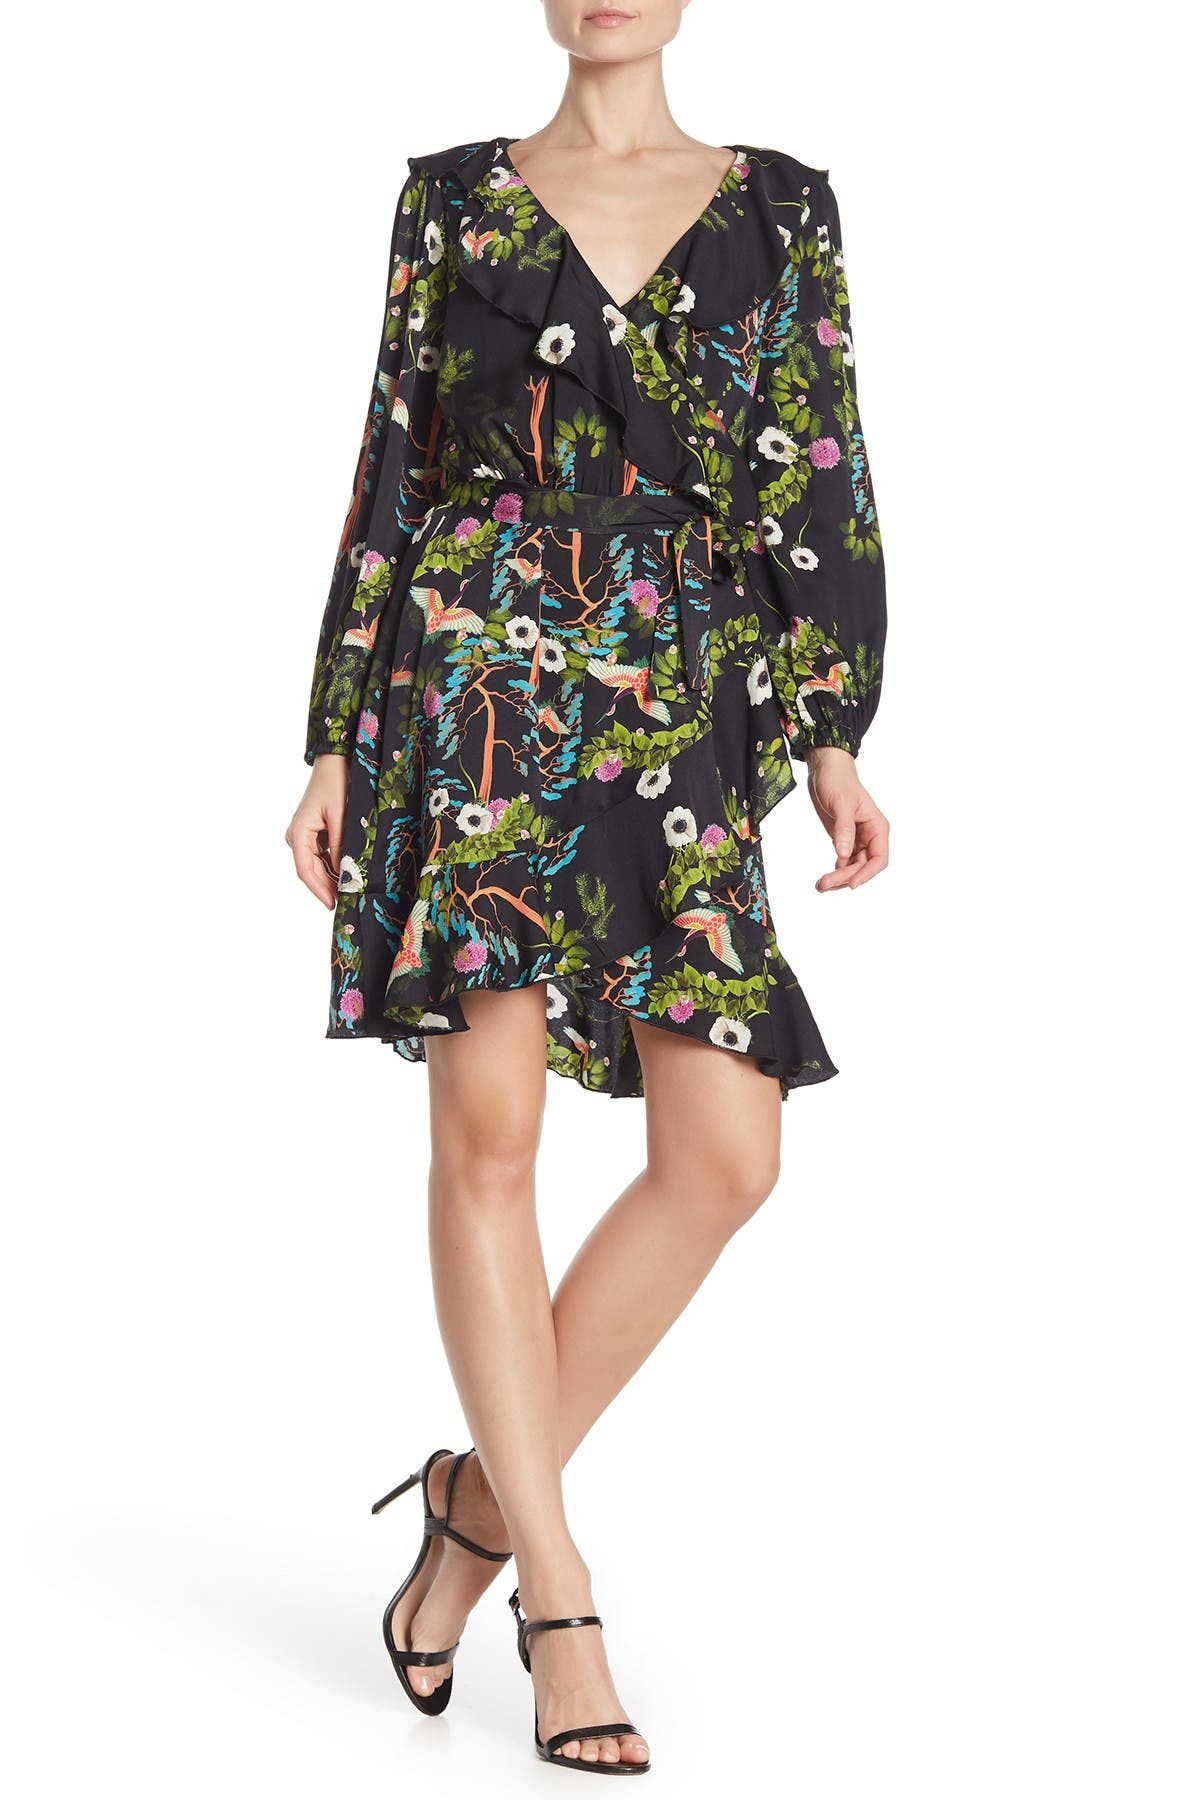 Image of Cynthia Rowley Malibu Floral Print Wrap Dress